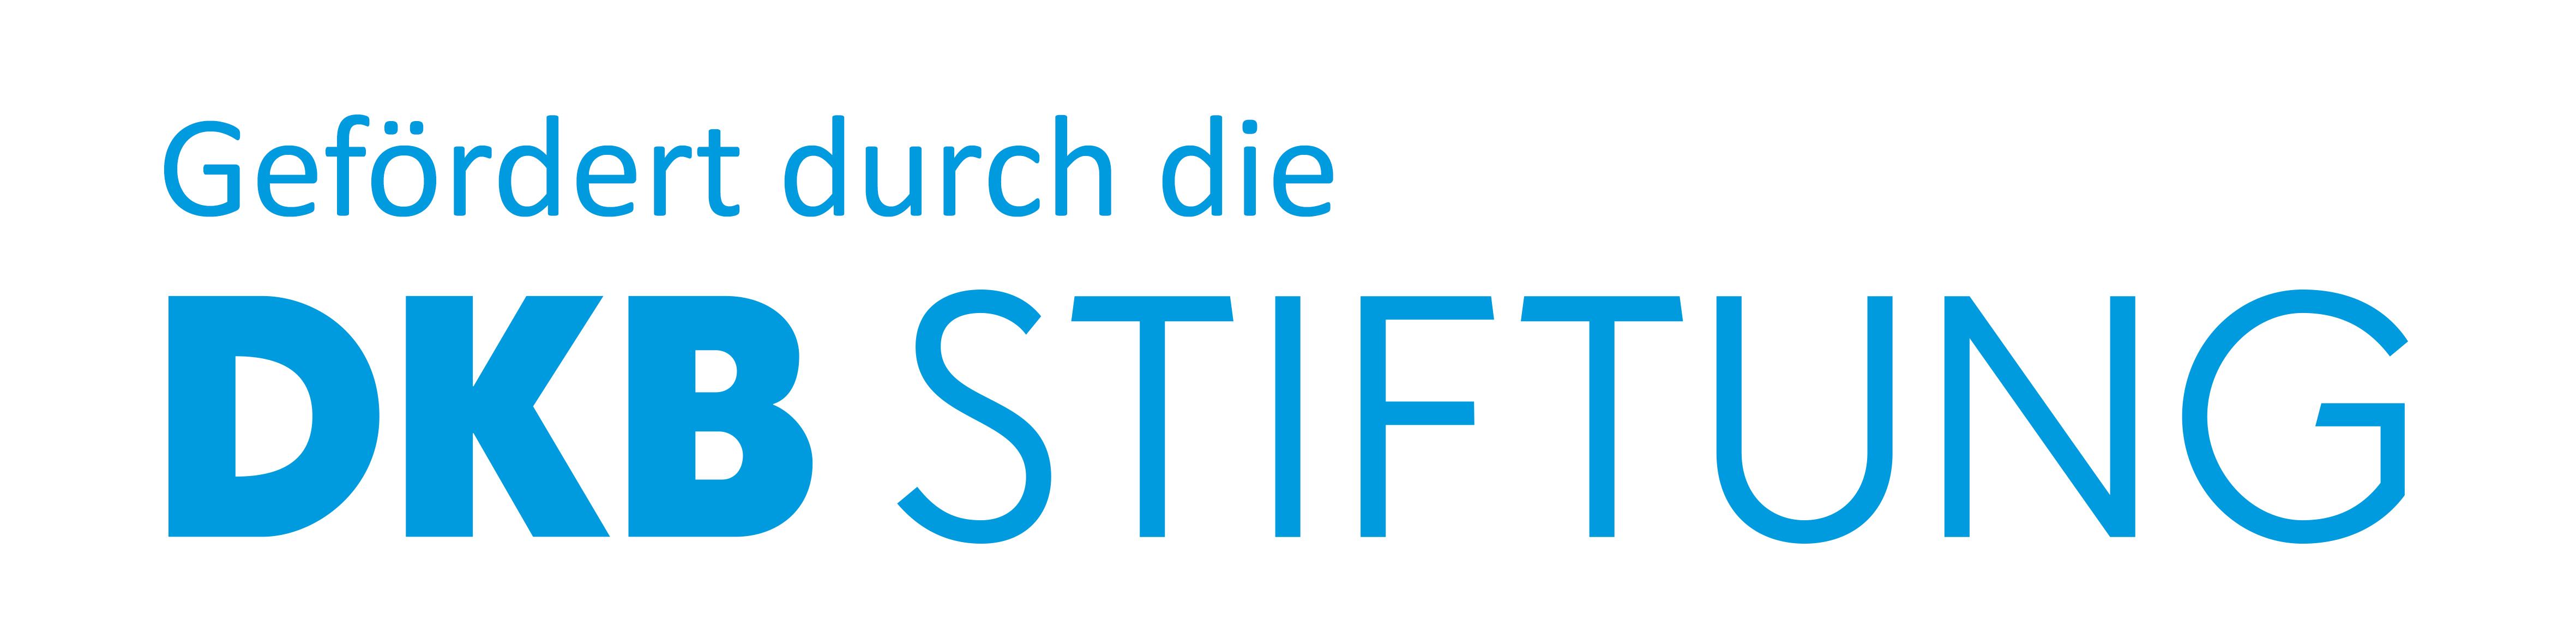 Logo DKB STIFTUNG neu